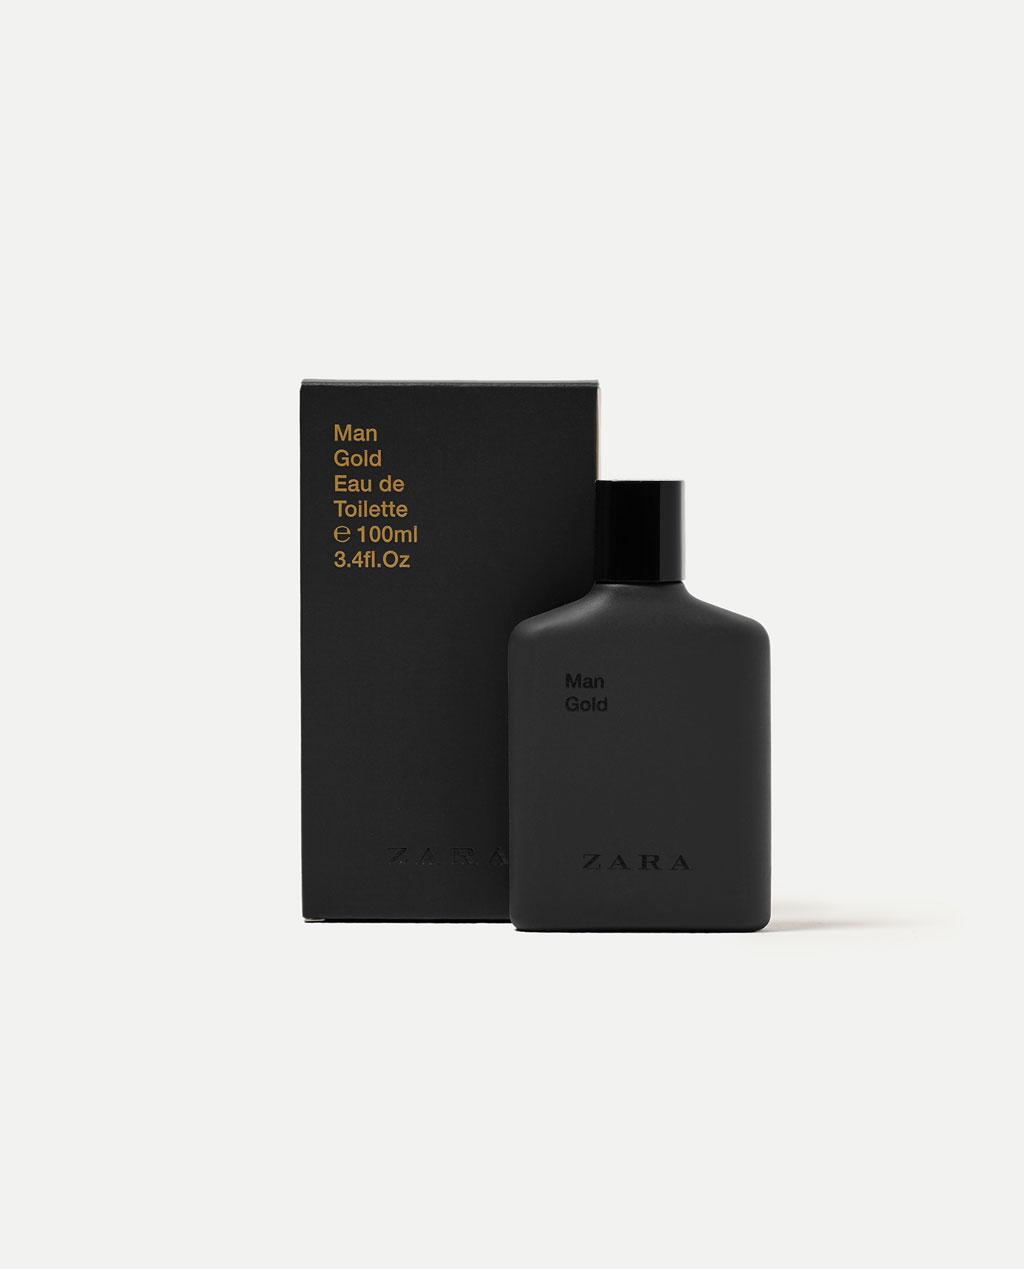 Man Gold Zara cologne - a new fragrance for men 2017 cfe6471c4d